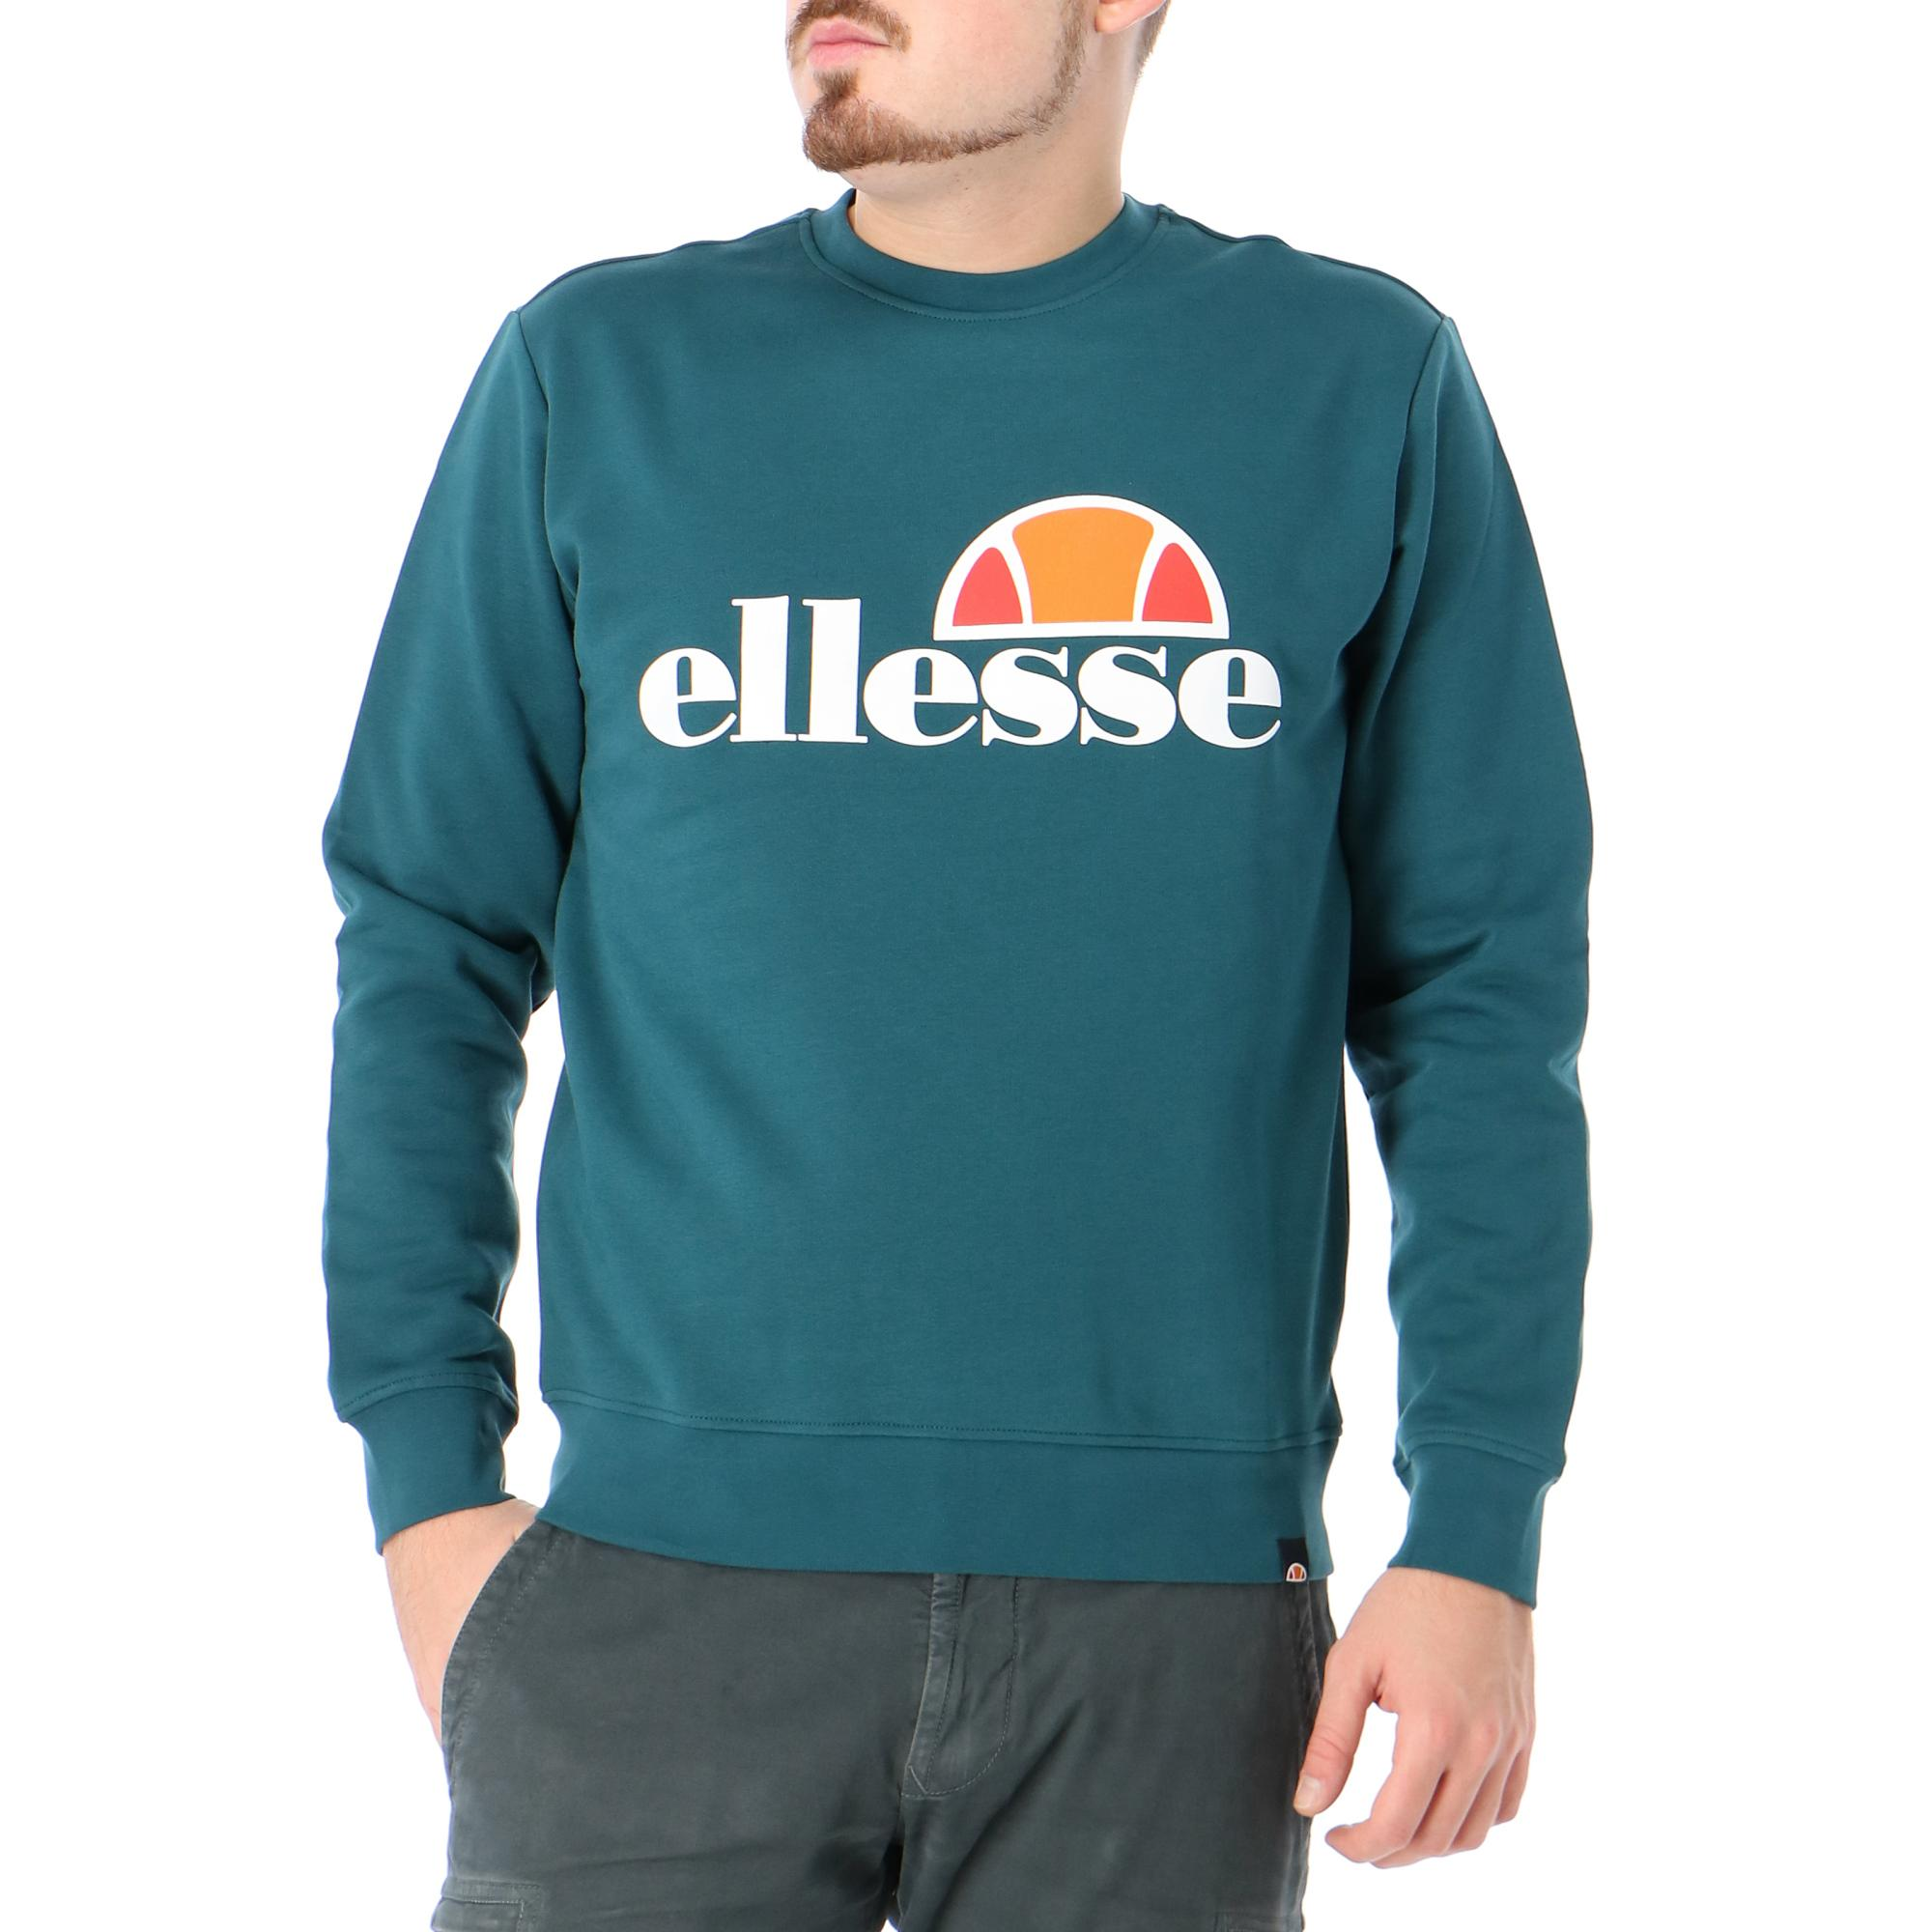 Ellesse Crew Neck Logo Deep teal